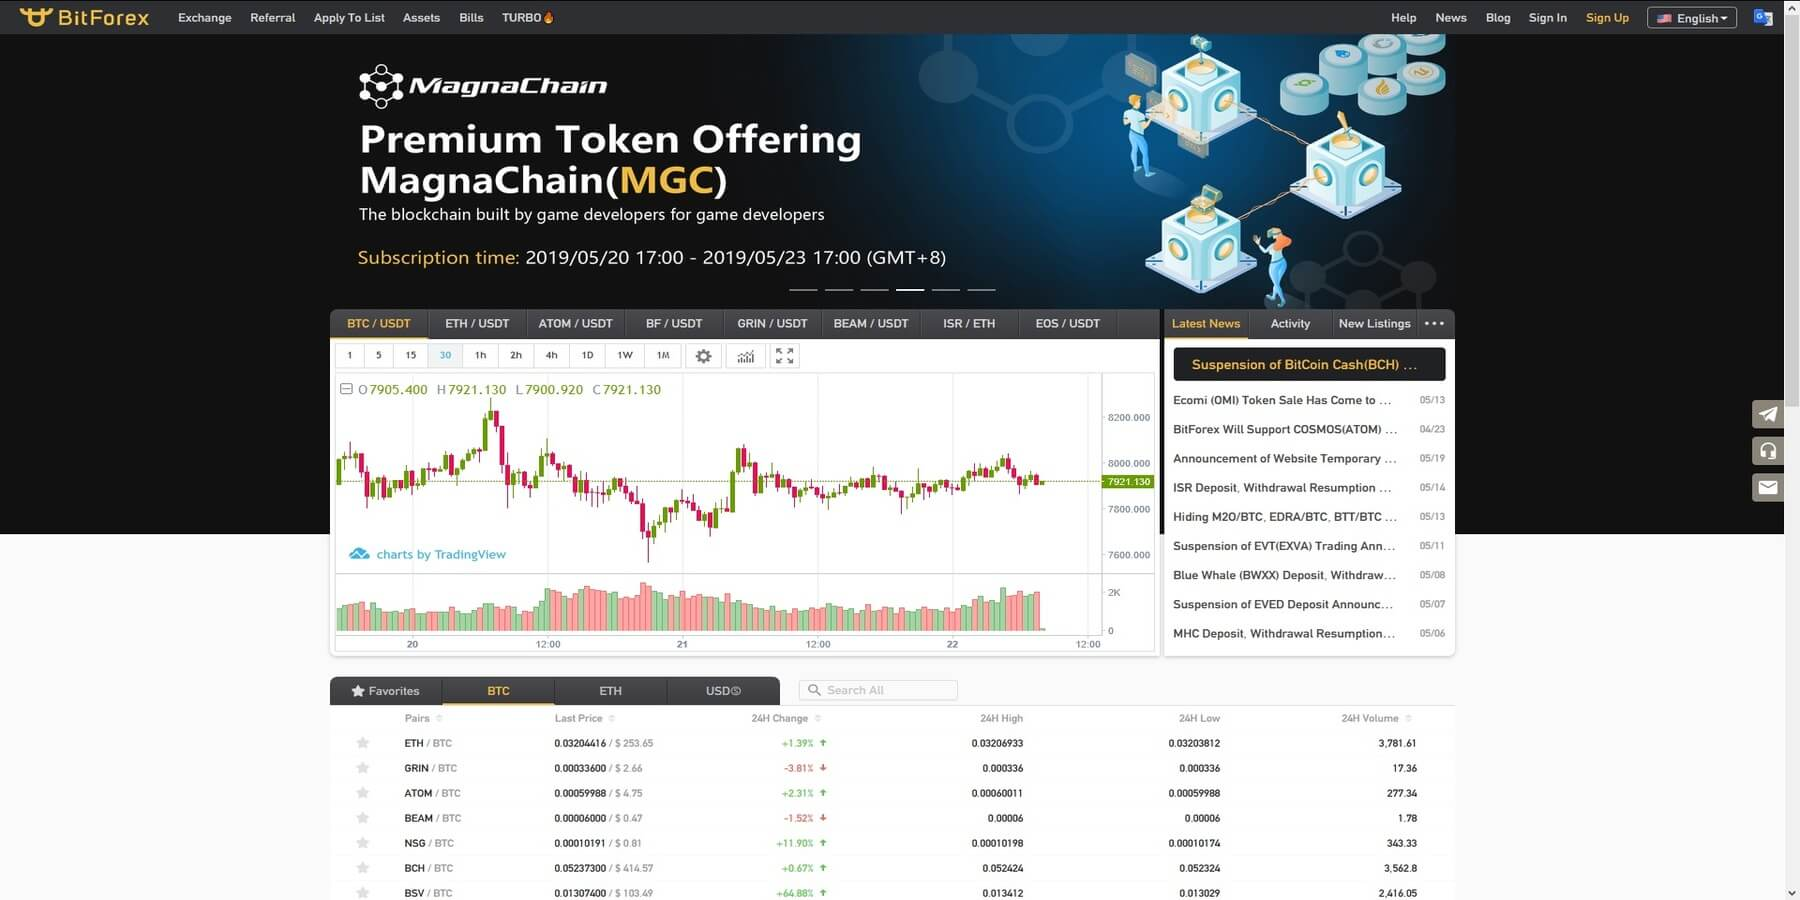 Acheter des cryptomonnaies sur BitForex